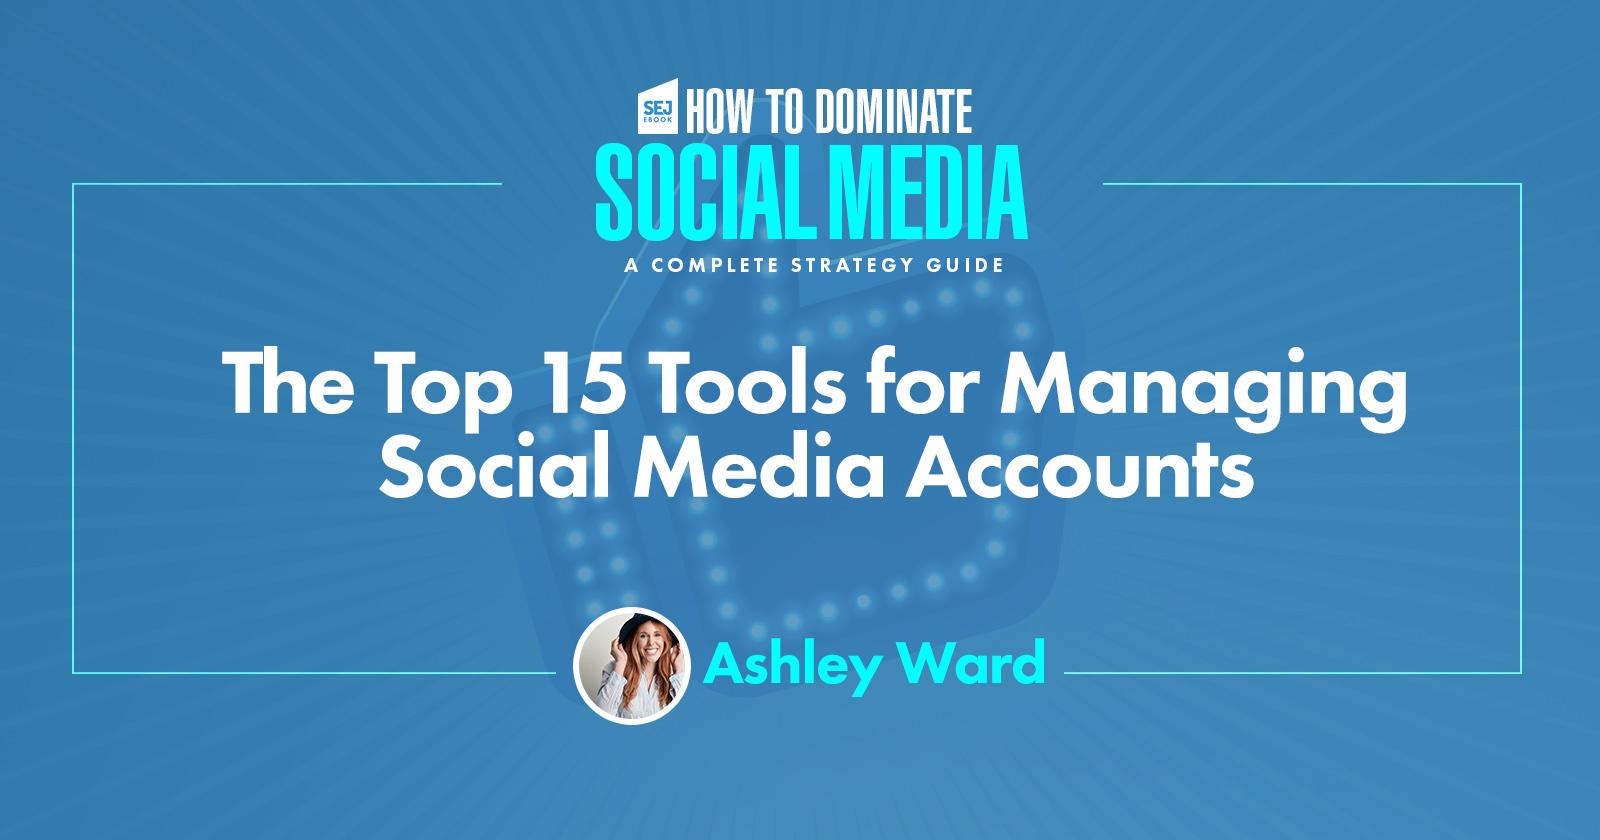 The Top 15 Tools for Managing Social Media Accounts